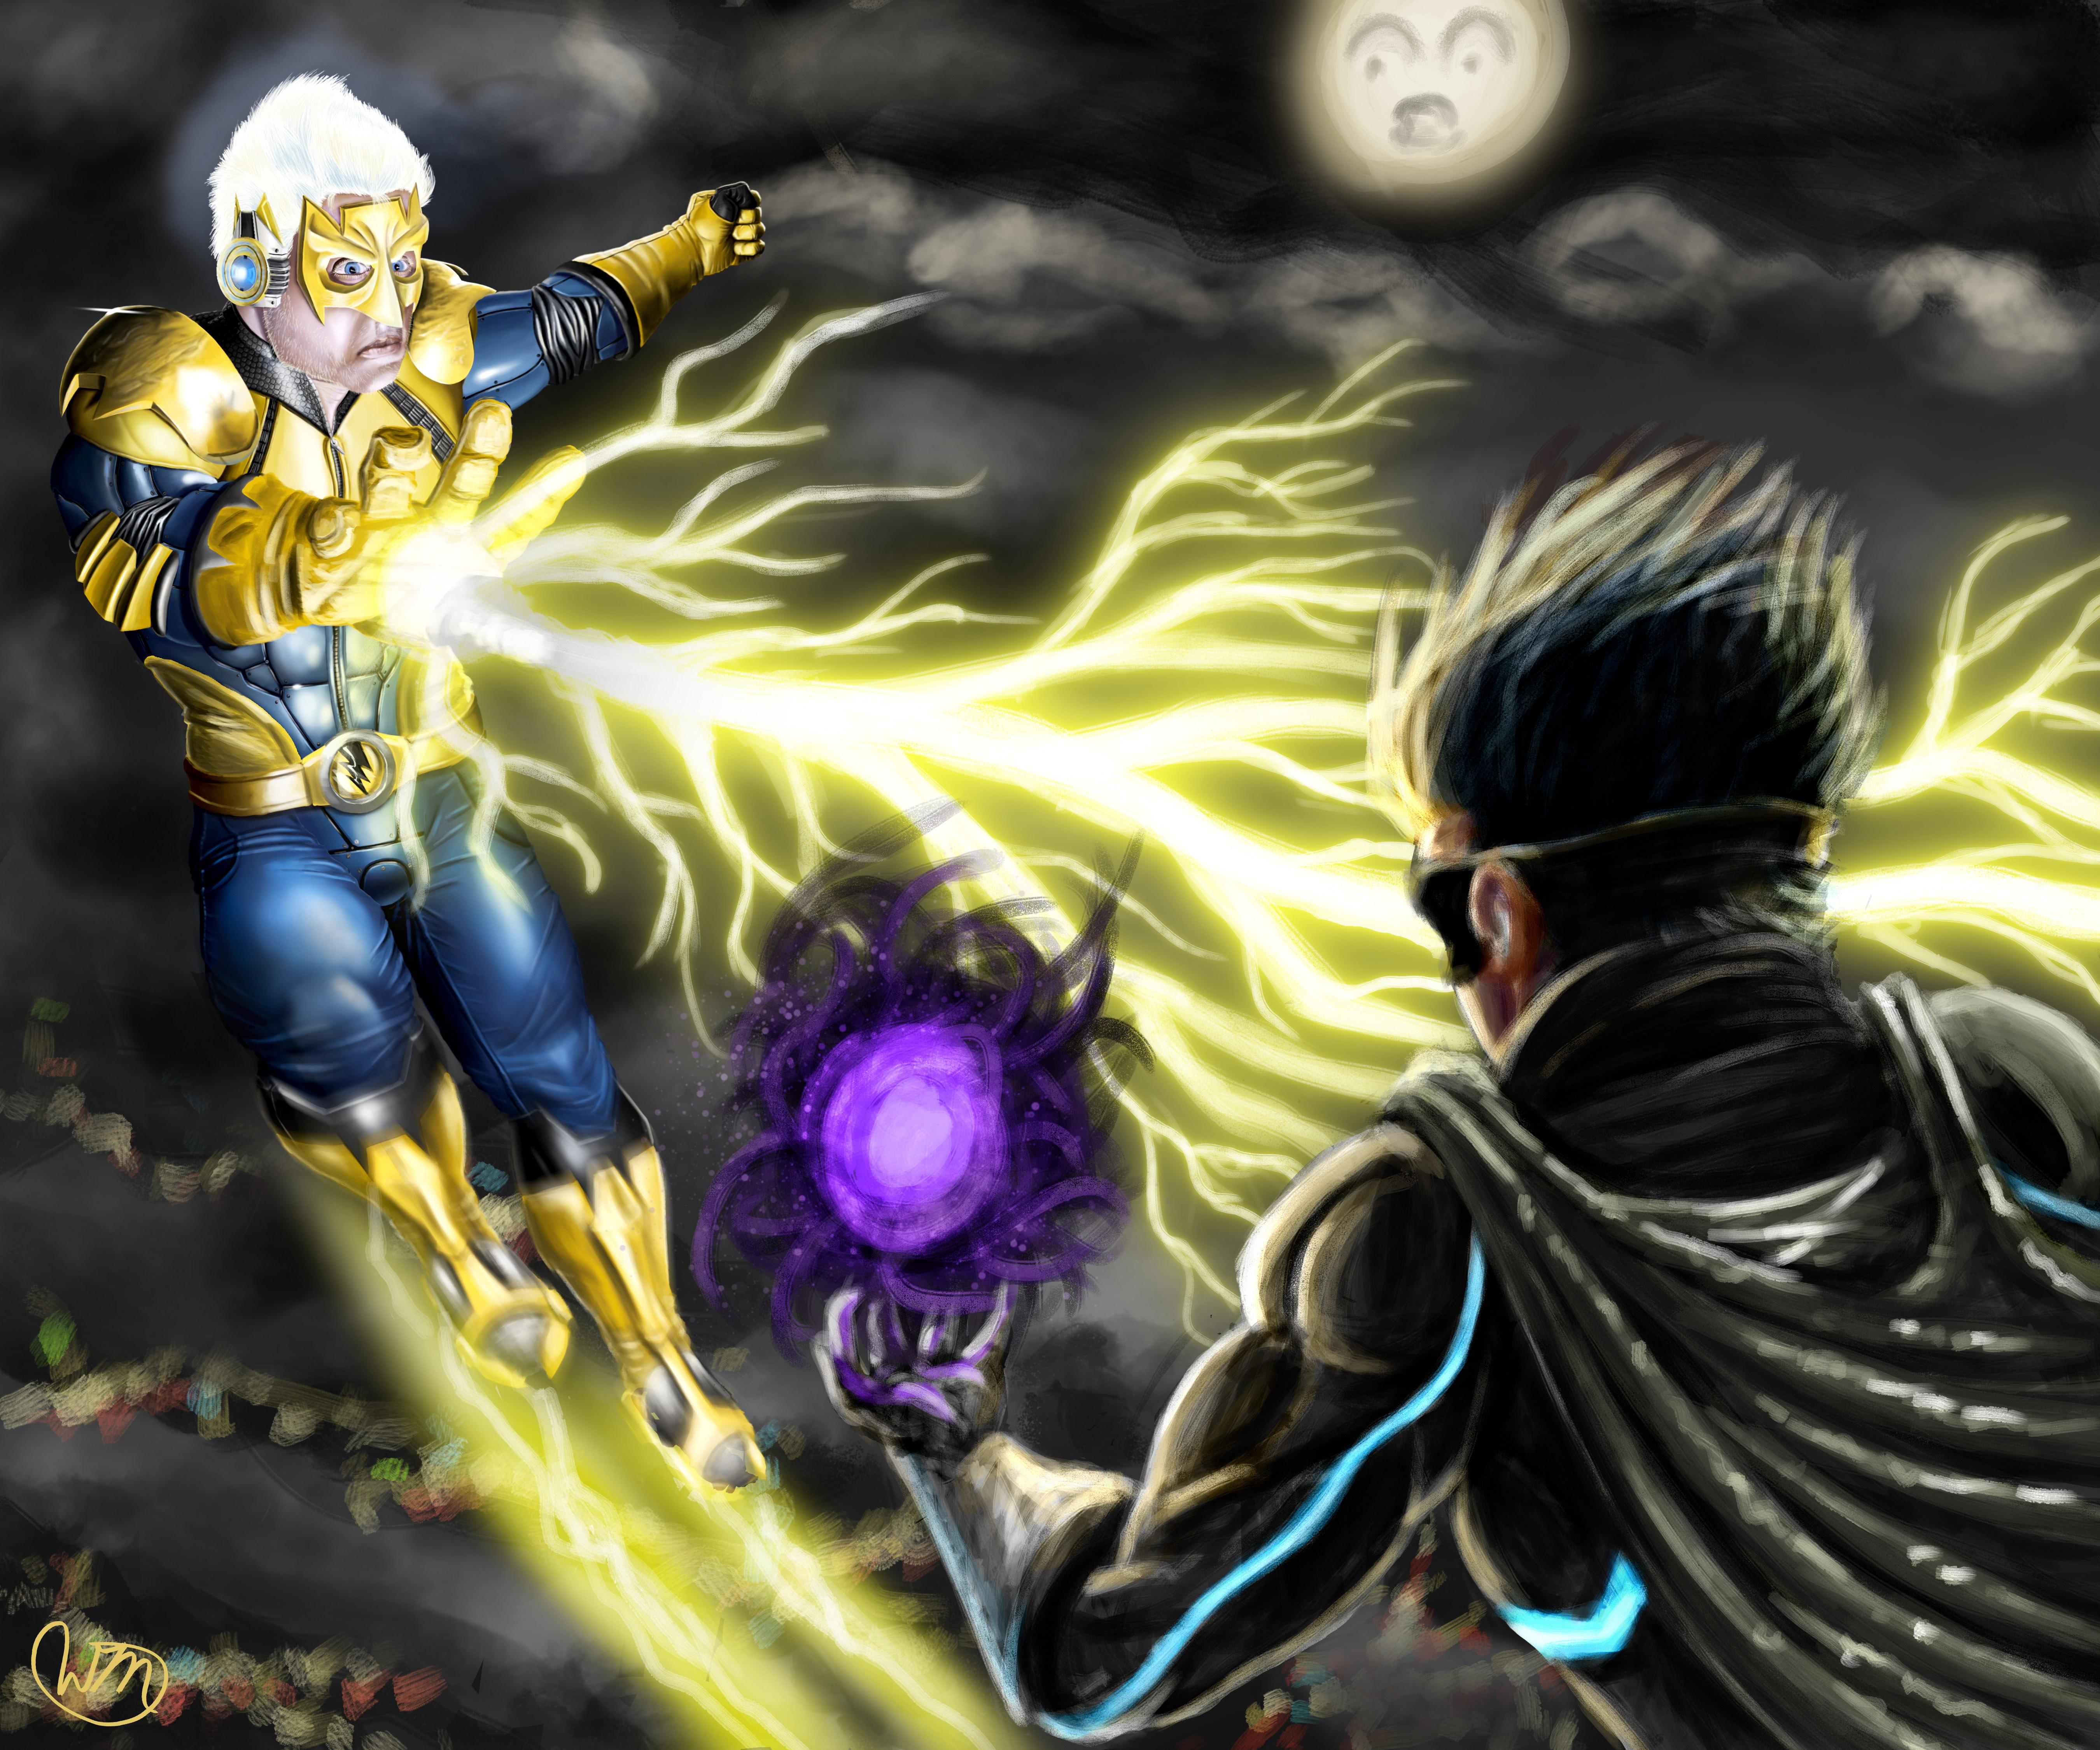 Lightning Man V.S. The WIng by WillMayesArt on Newgrounds